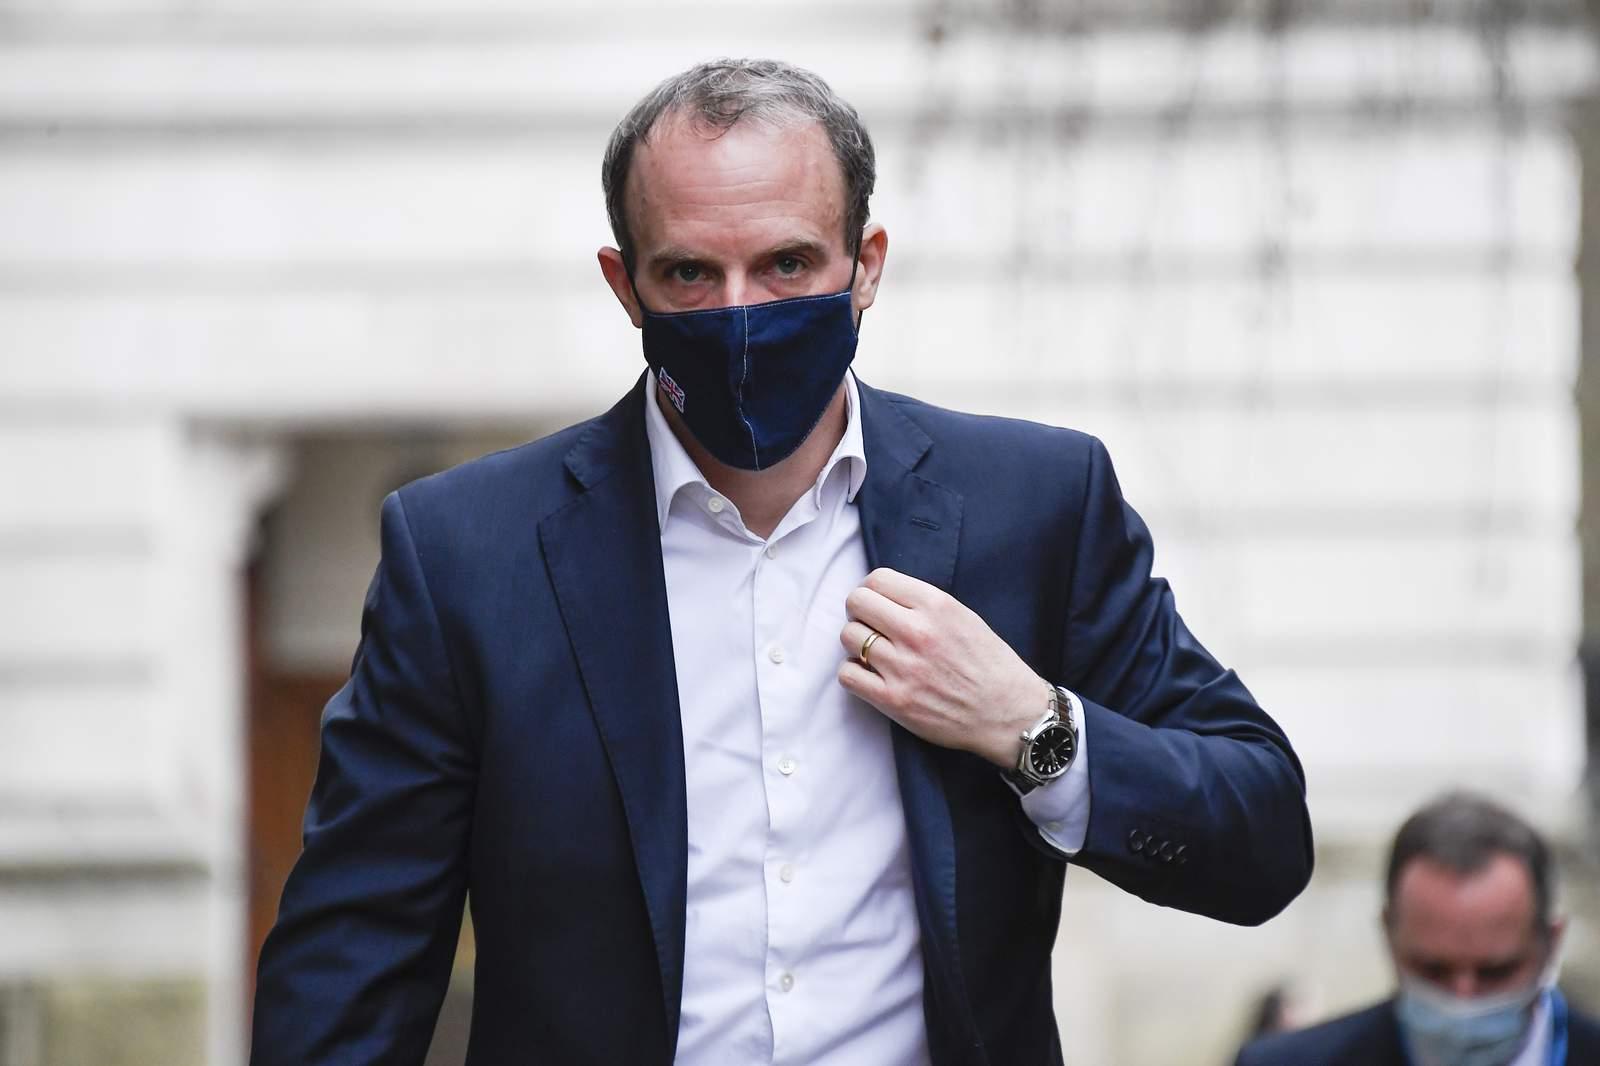 Top diplomats of US, UK, France, Germany hold virtual talks